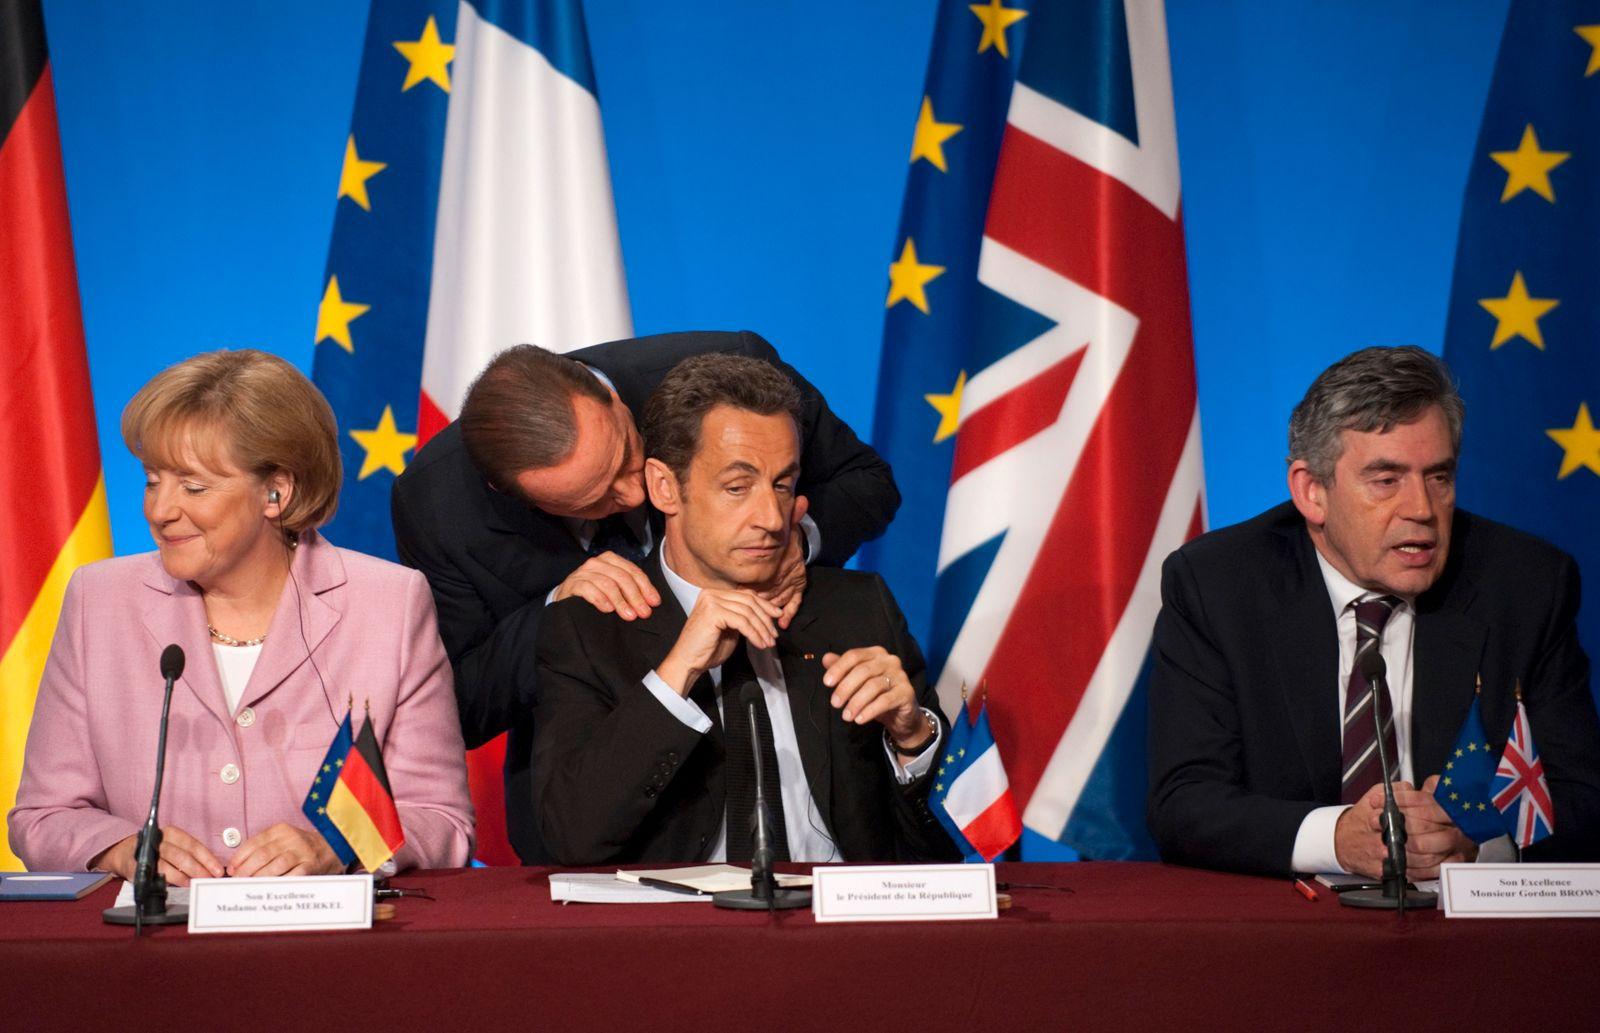 Duo Merkel / Sarkozy